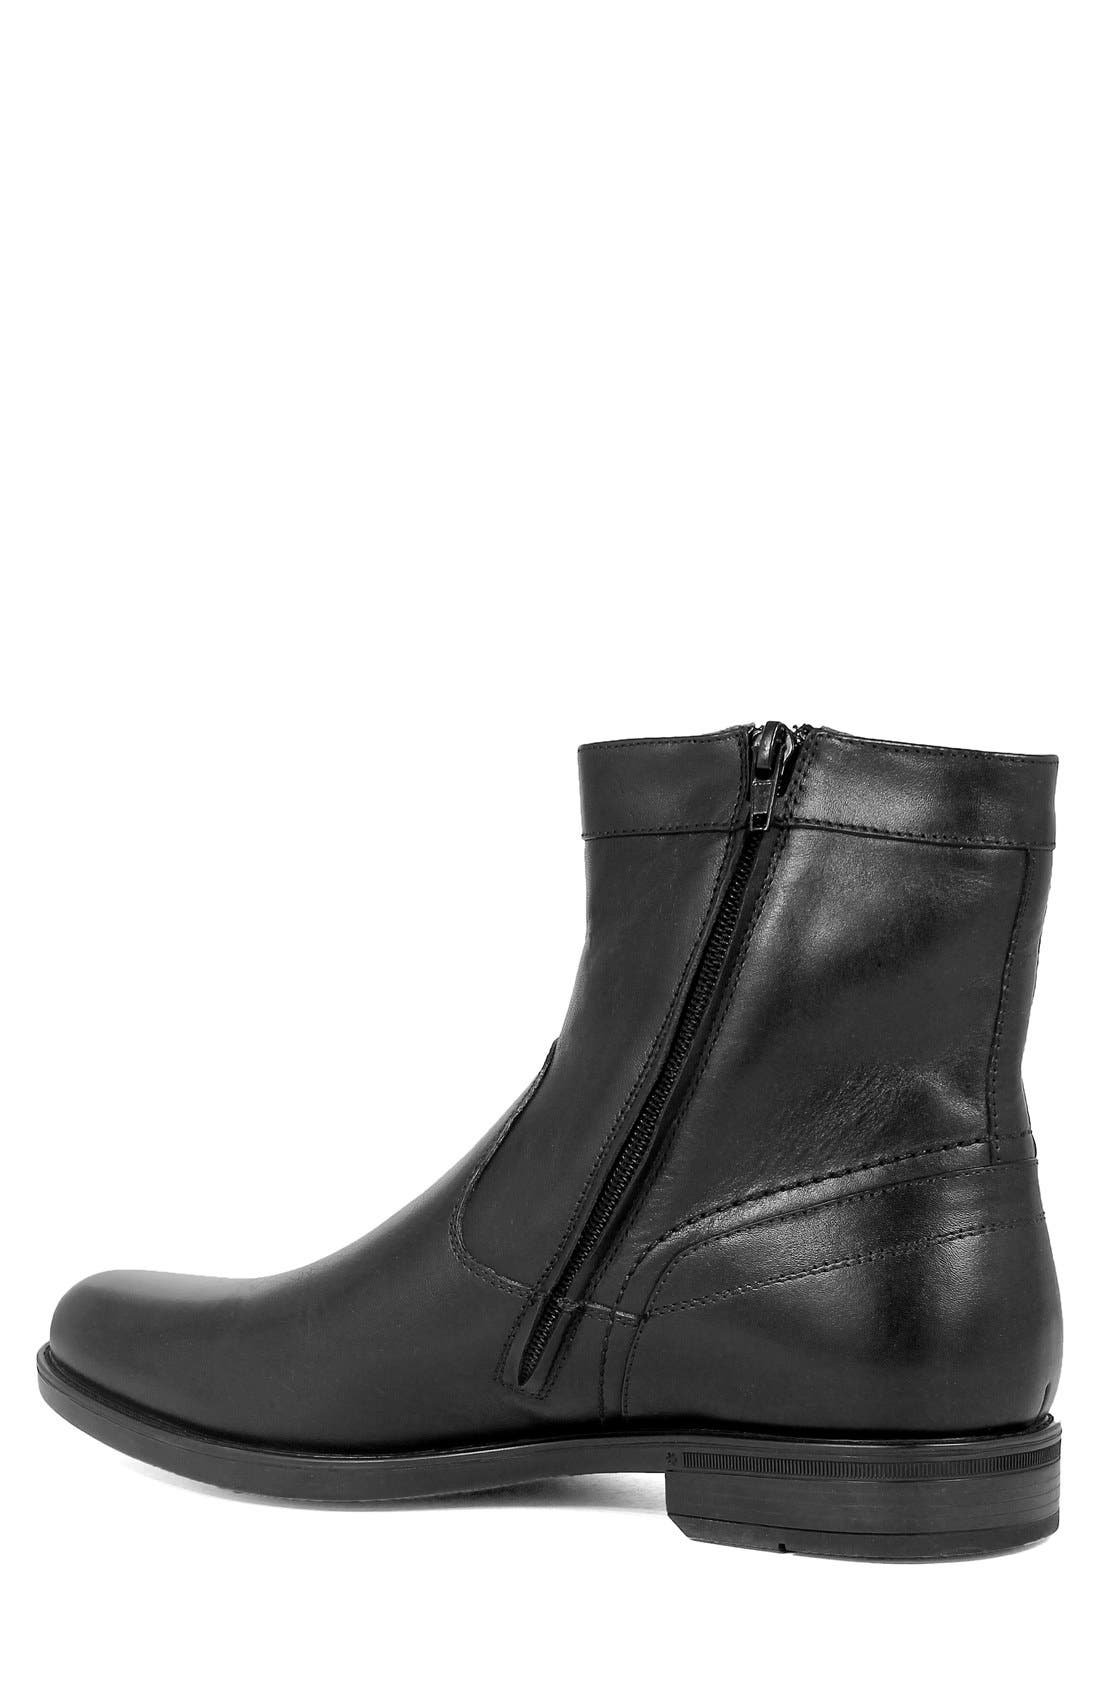 FLORSHEIM, 'Midtown' Zip Boot, Alternate thumbnail 2, color, BLACK LEATHER